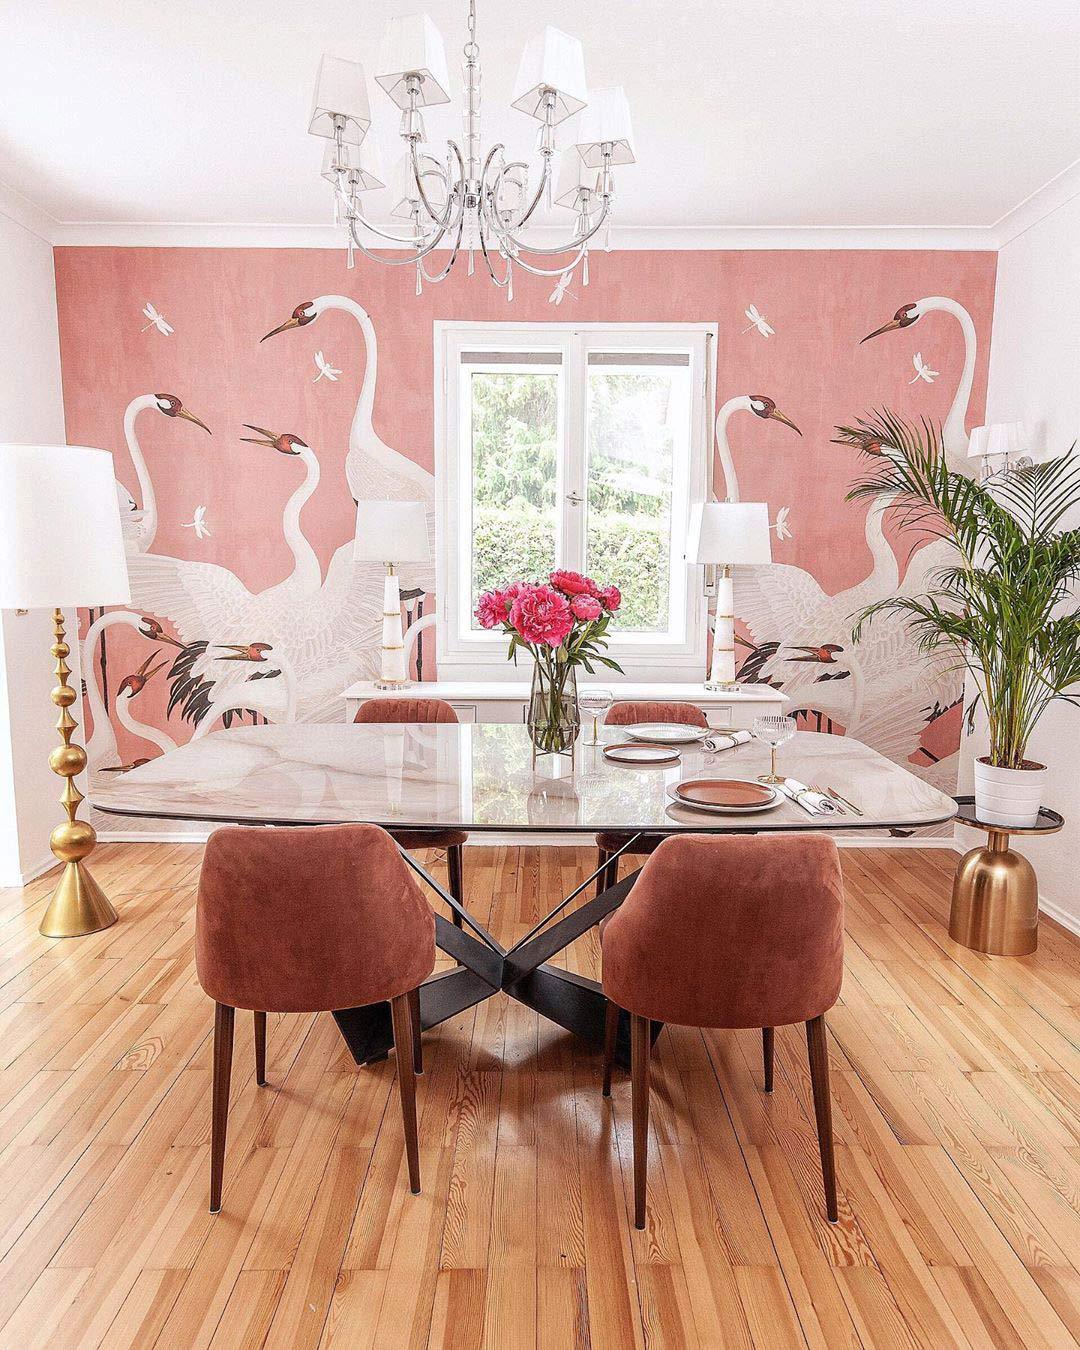 wallpaper-gucci-heron-dining-room